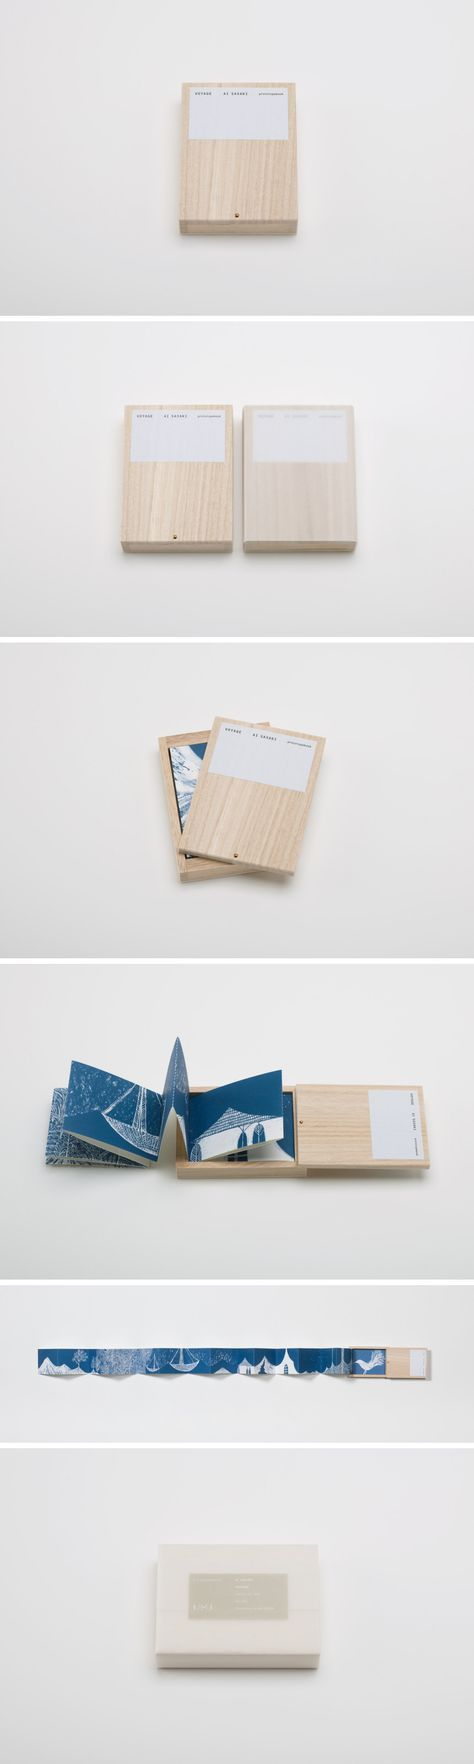 Prototypebook / Ai Sasaki: VOYAGE. must make one of these